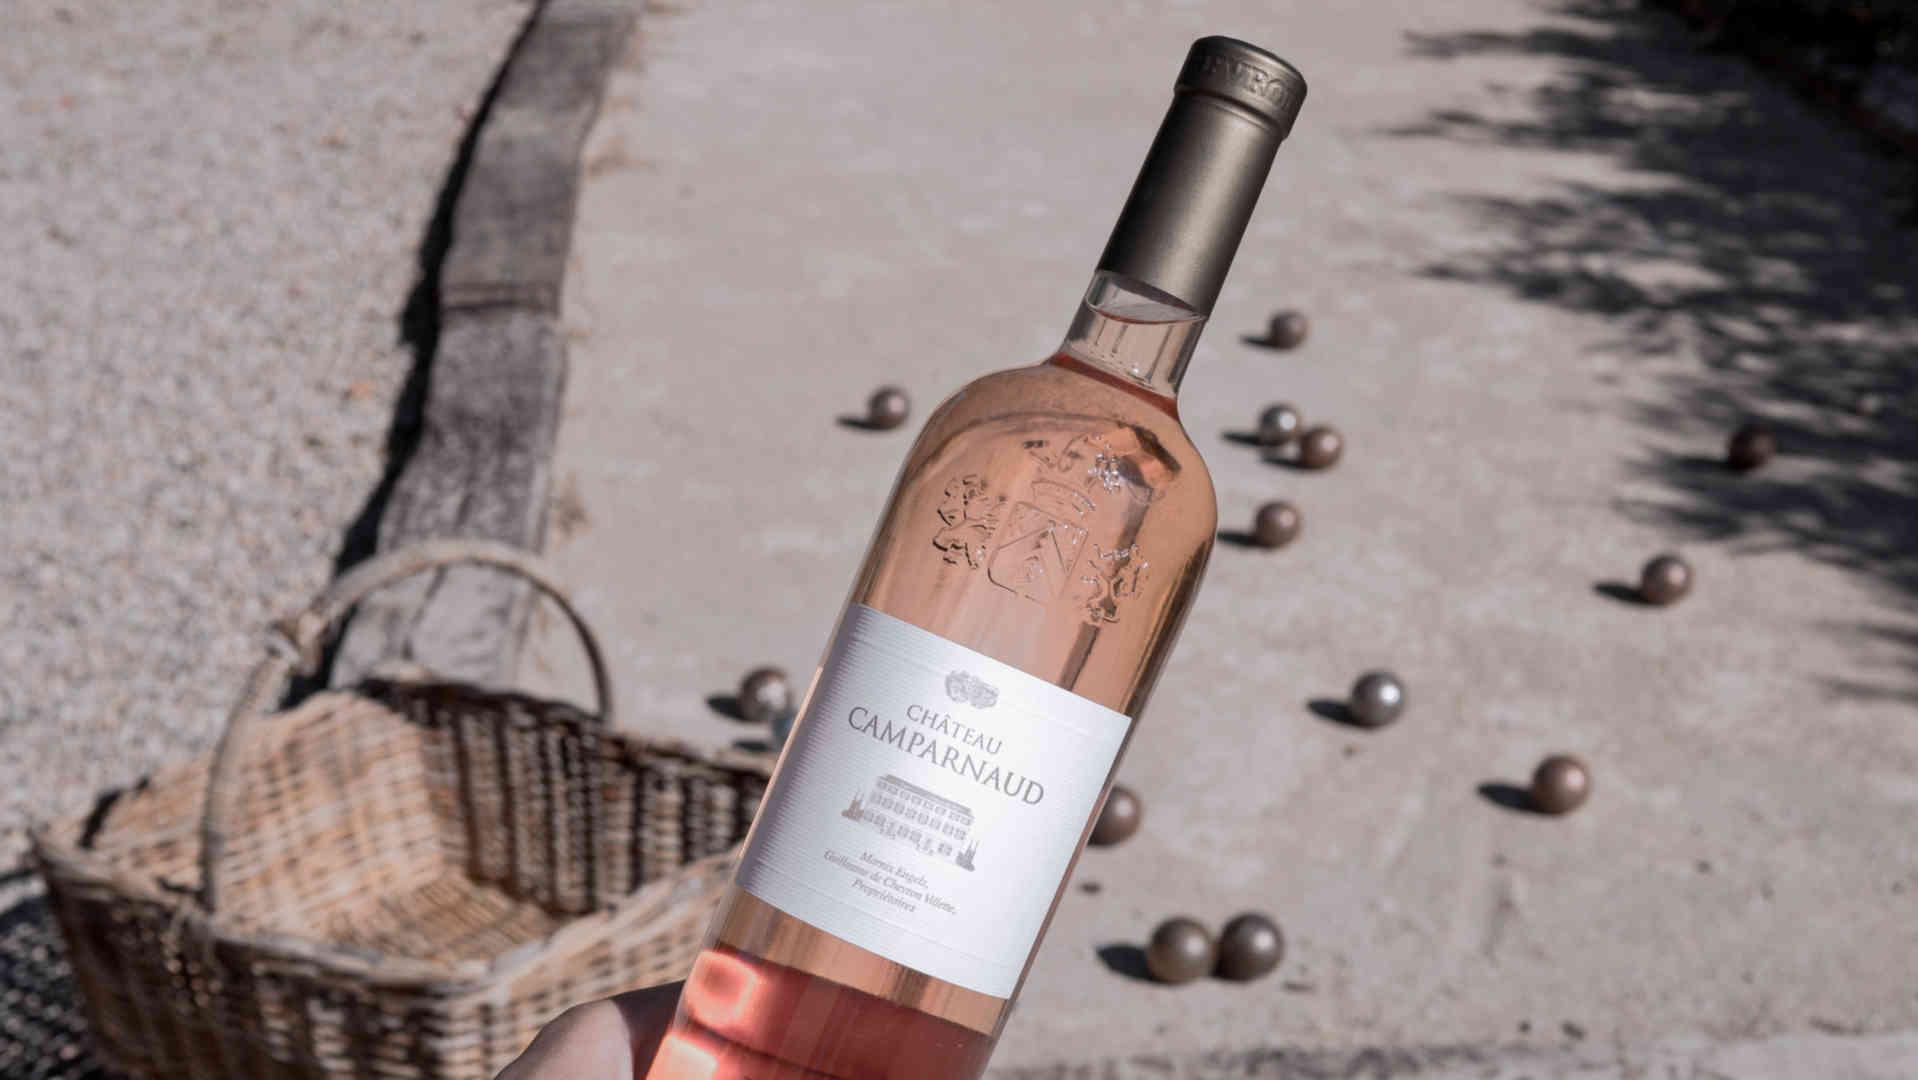 Prestige - Camparnaud_Provence_rosé_-_sm